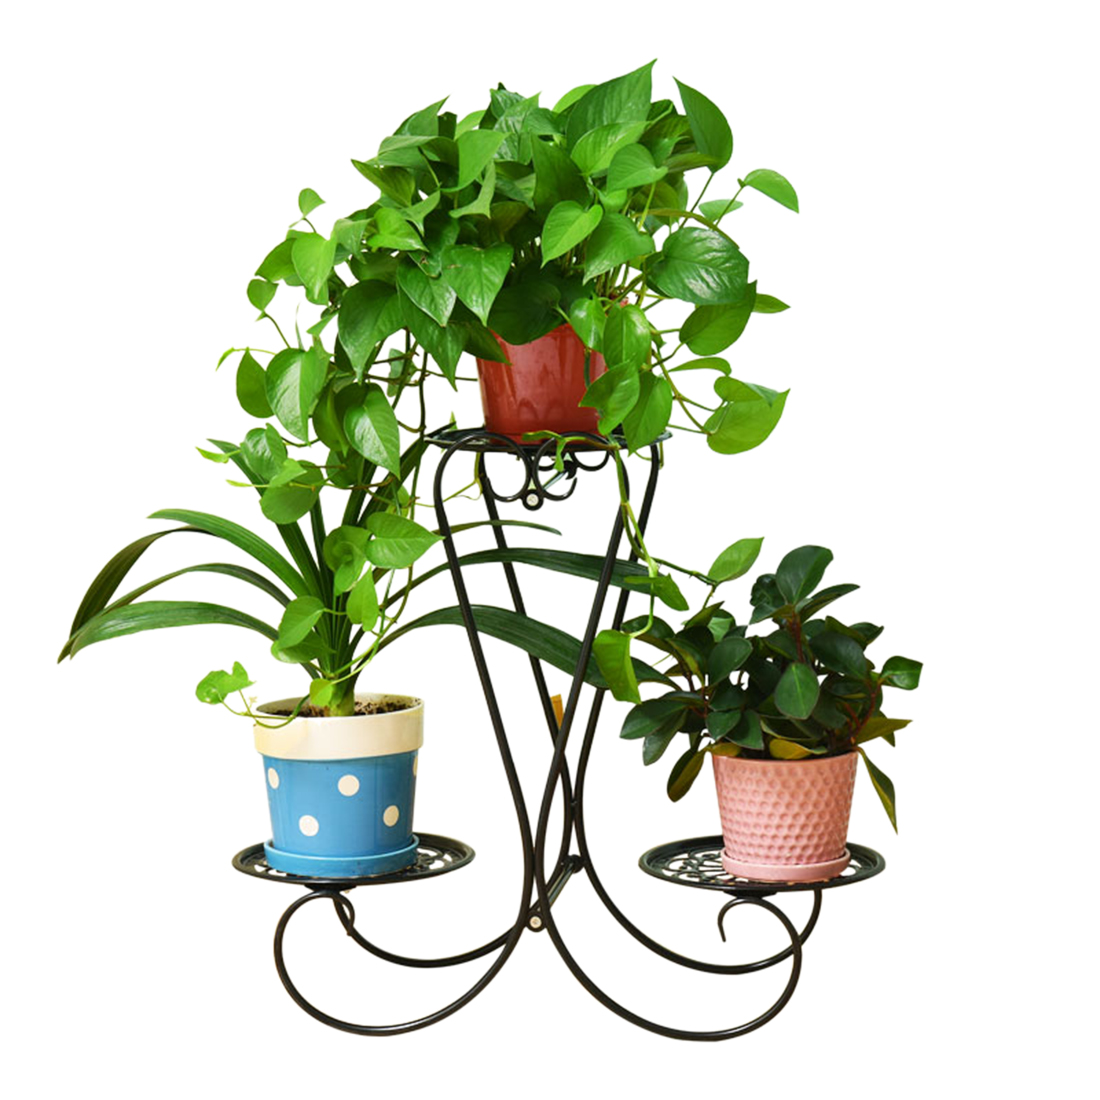 VICTMAX 60cm European Style Wrought Iron Plant Stand Flower Pot Holder For Home Garden Decor - Black